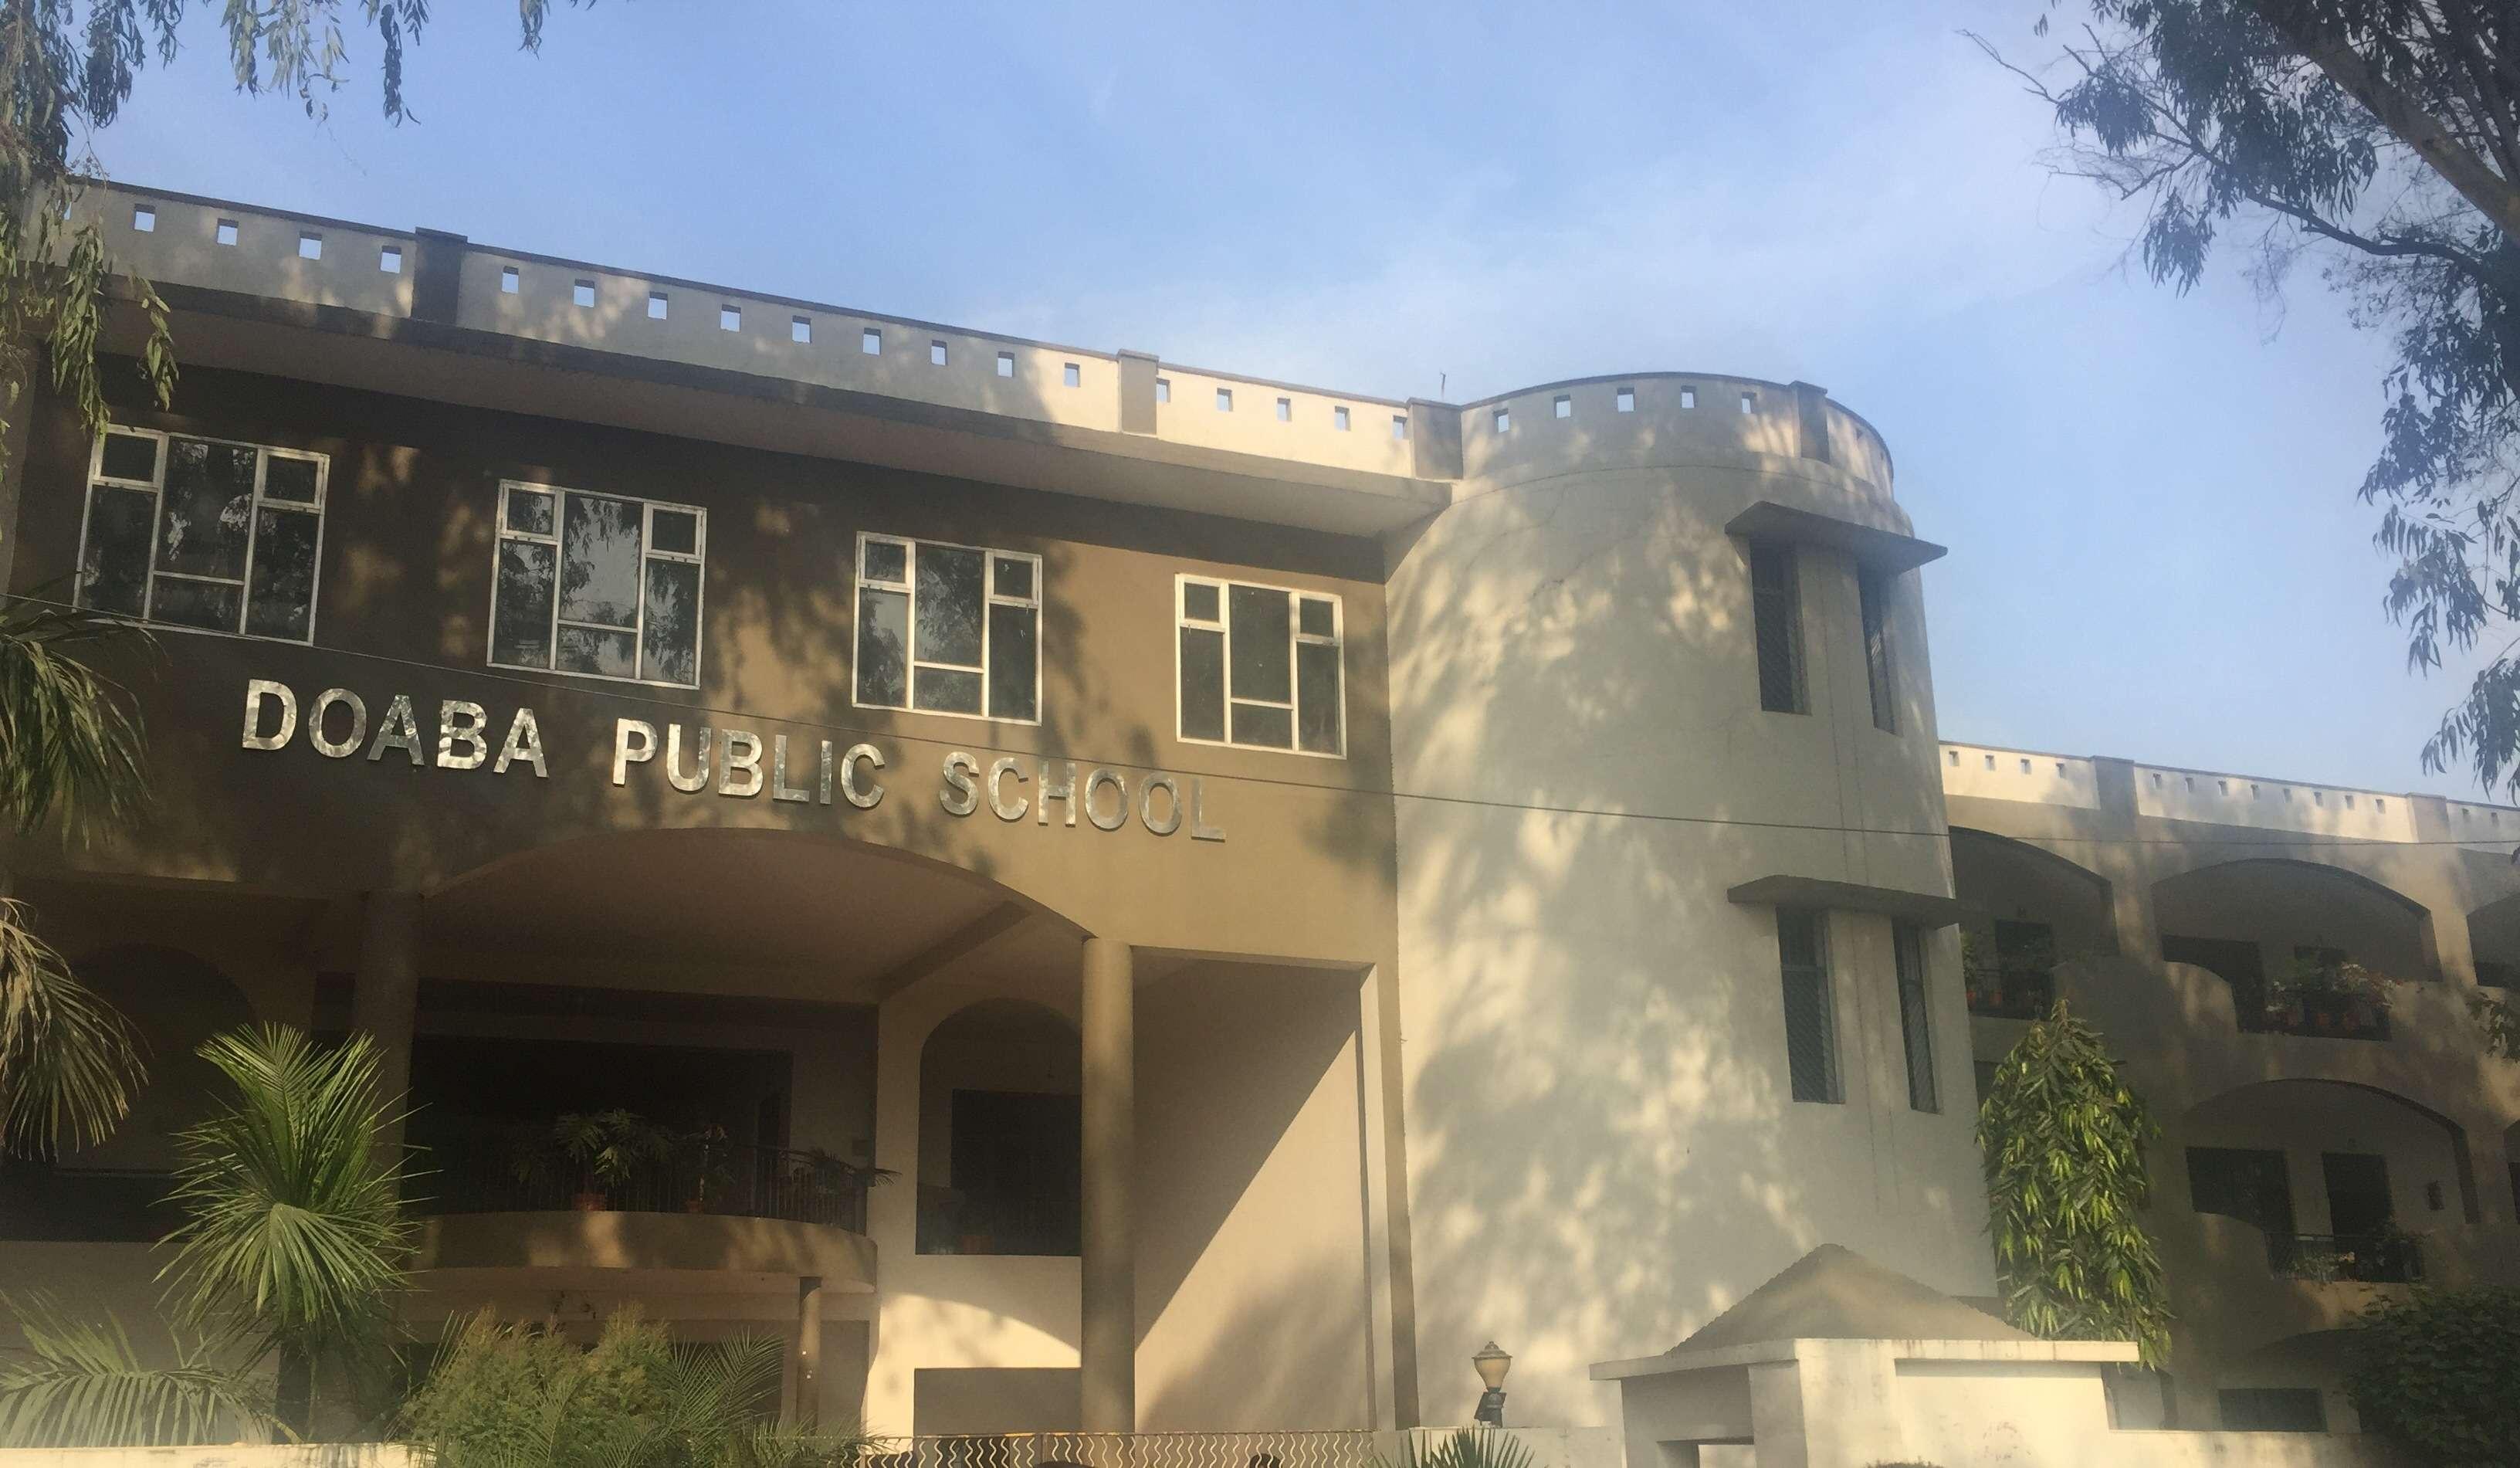 DOABA PUBLIC SCHOOL KOT SANTOKH RAI DISTT GURDASPUR PUNJAB 1630270